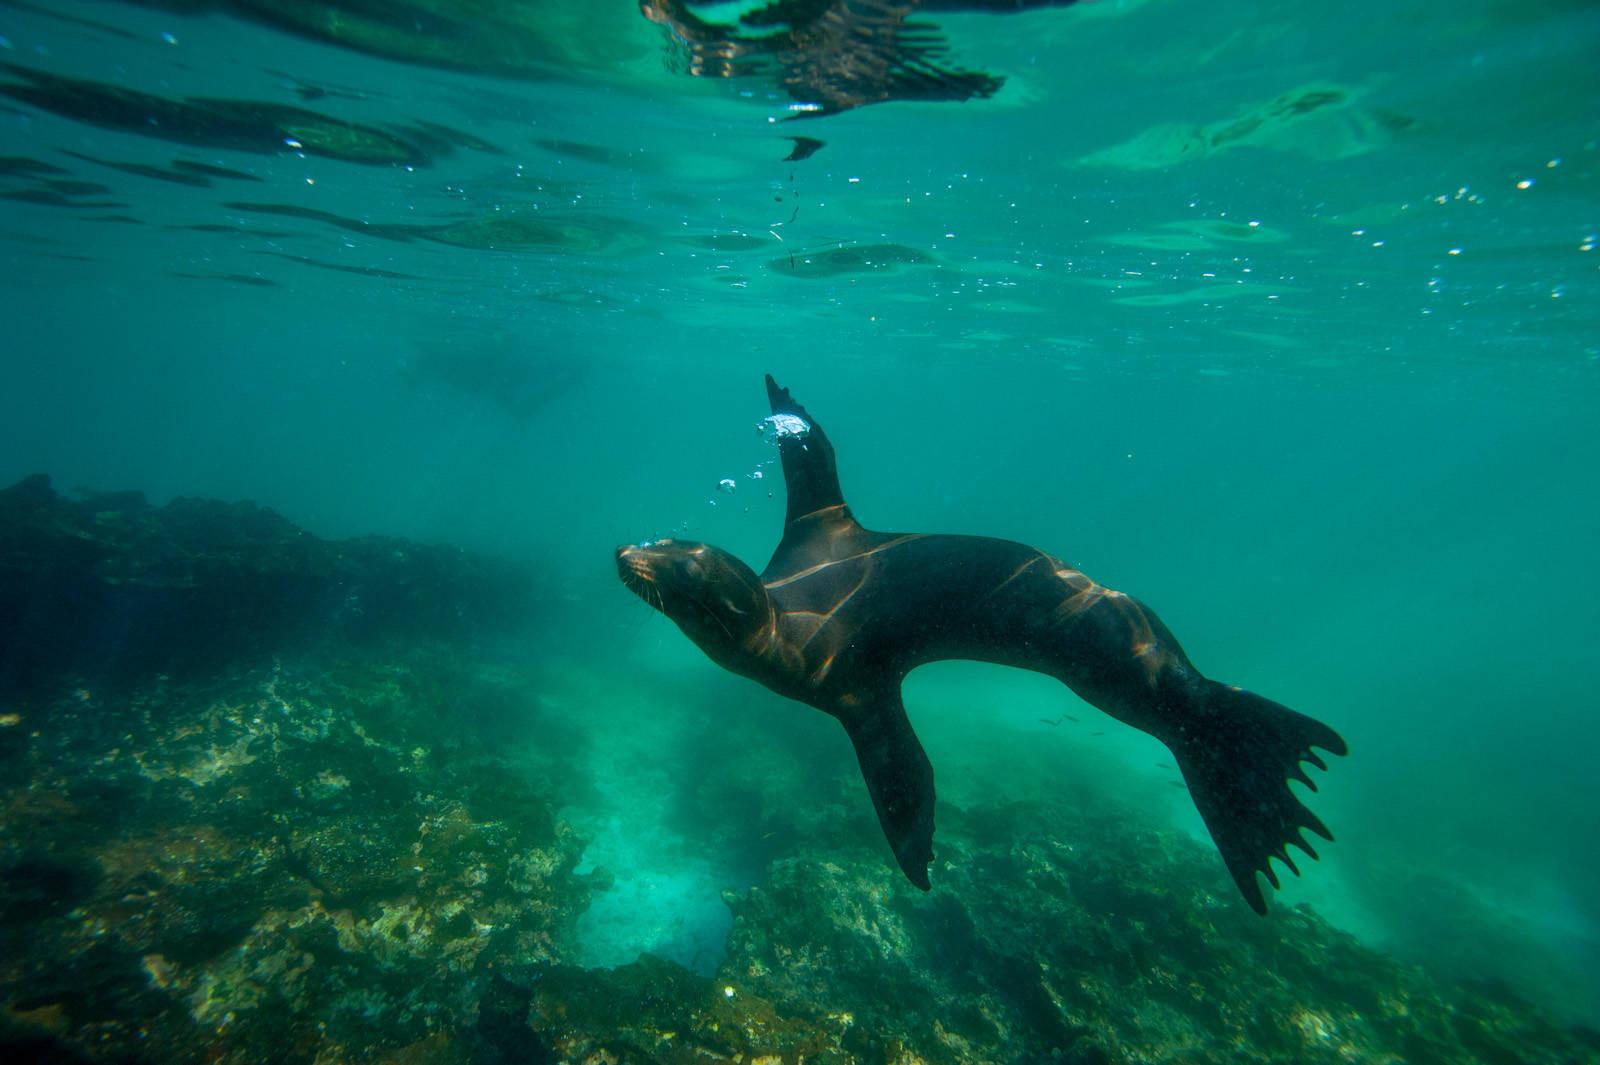 Photo: A Galapagos sea lion (Zalophus wollebaeki) in Galapagos National Park.